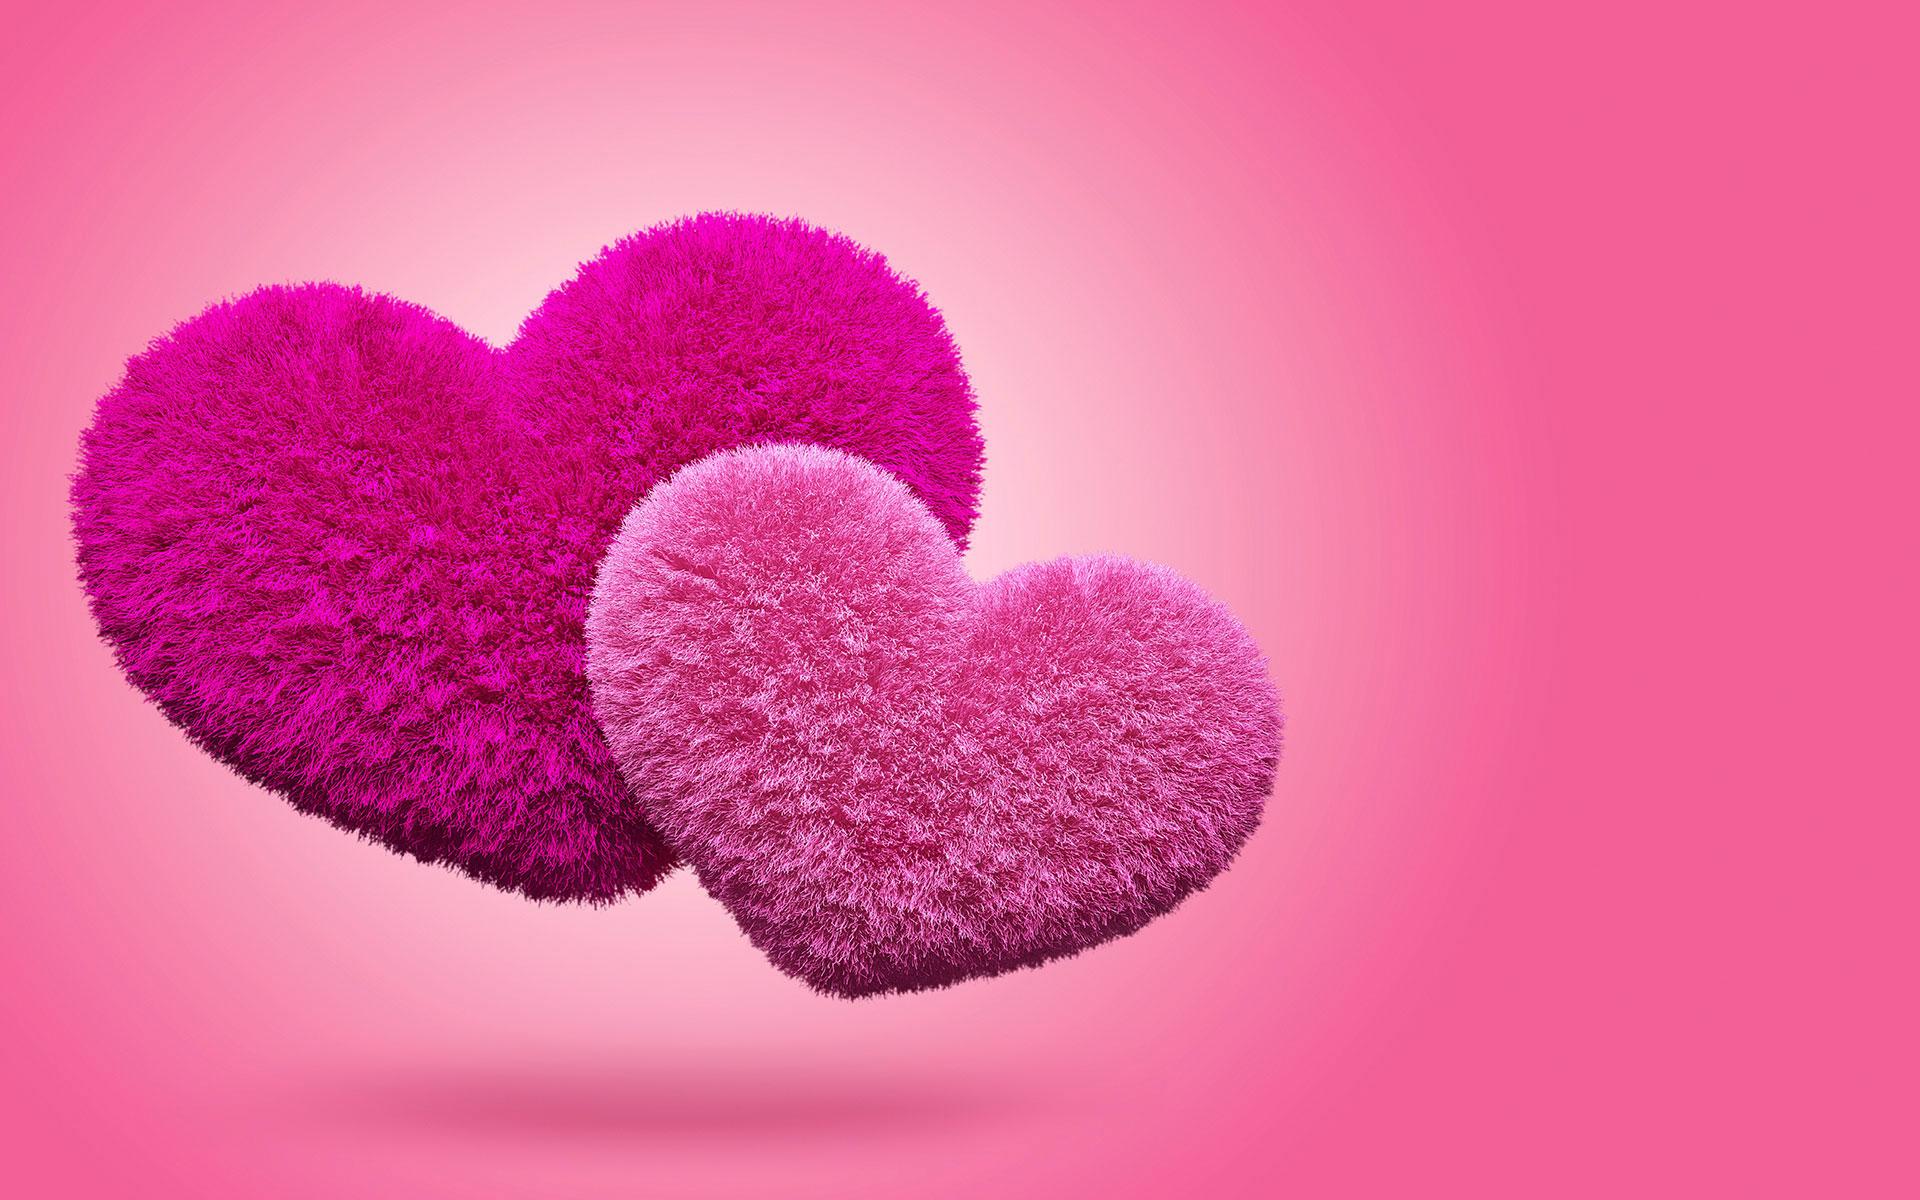 cute heart wallpapers,heart,pink,love,purple,violet